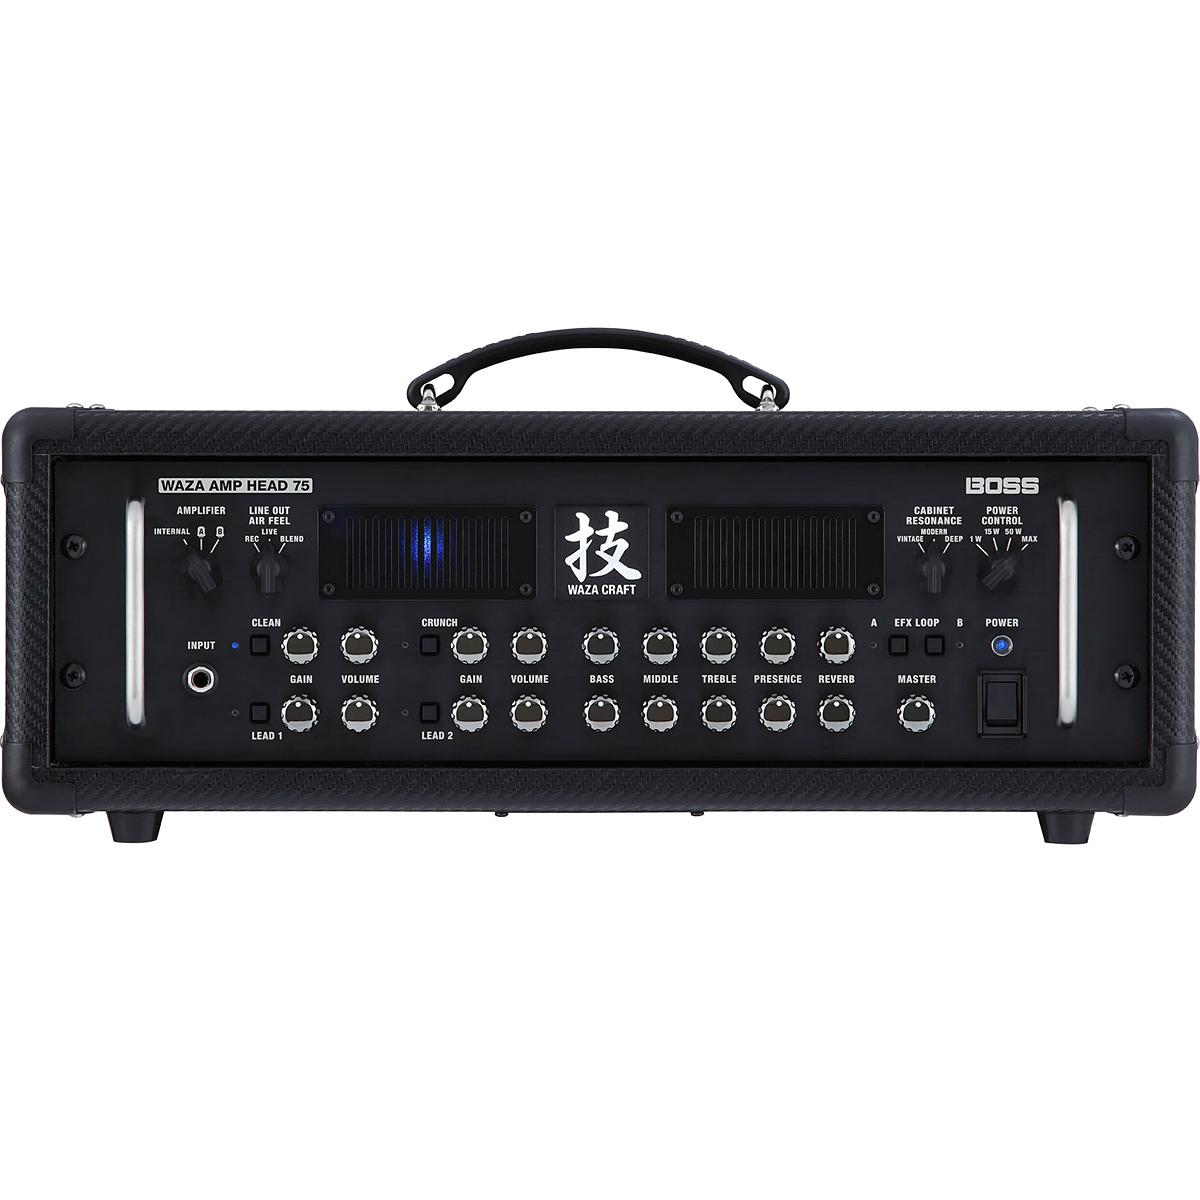 【75W】BOSS WAZA-HD75 Amp Head 新品 ギター用アンプヘッド[ボス][技クラフト,ワザ][Guitar Amplifier]